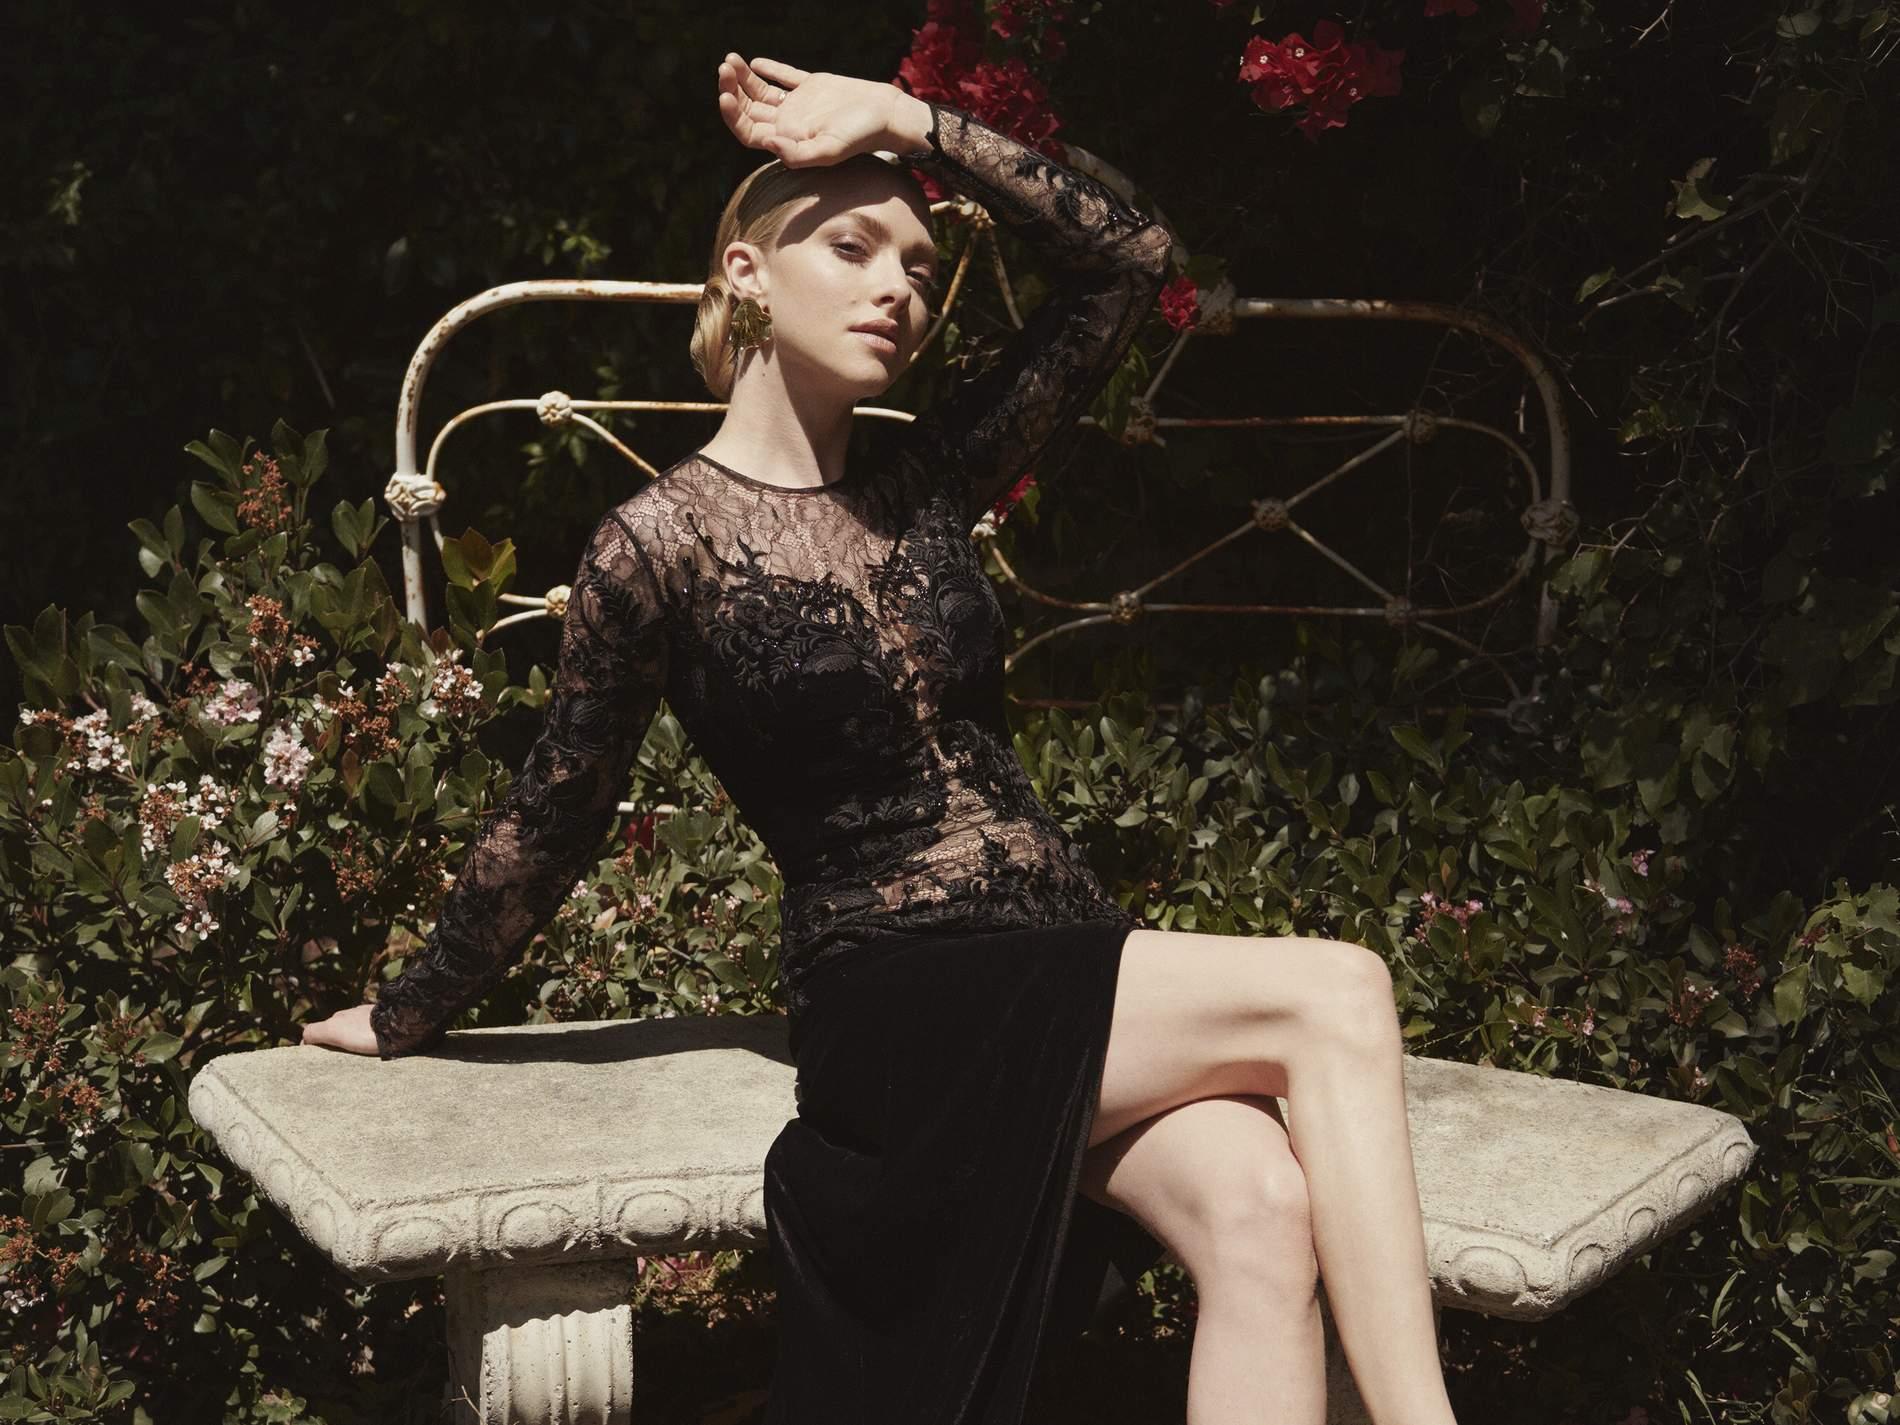 Amanda Seyfried Thong photo 3